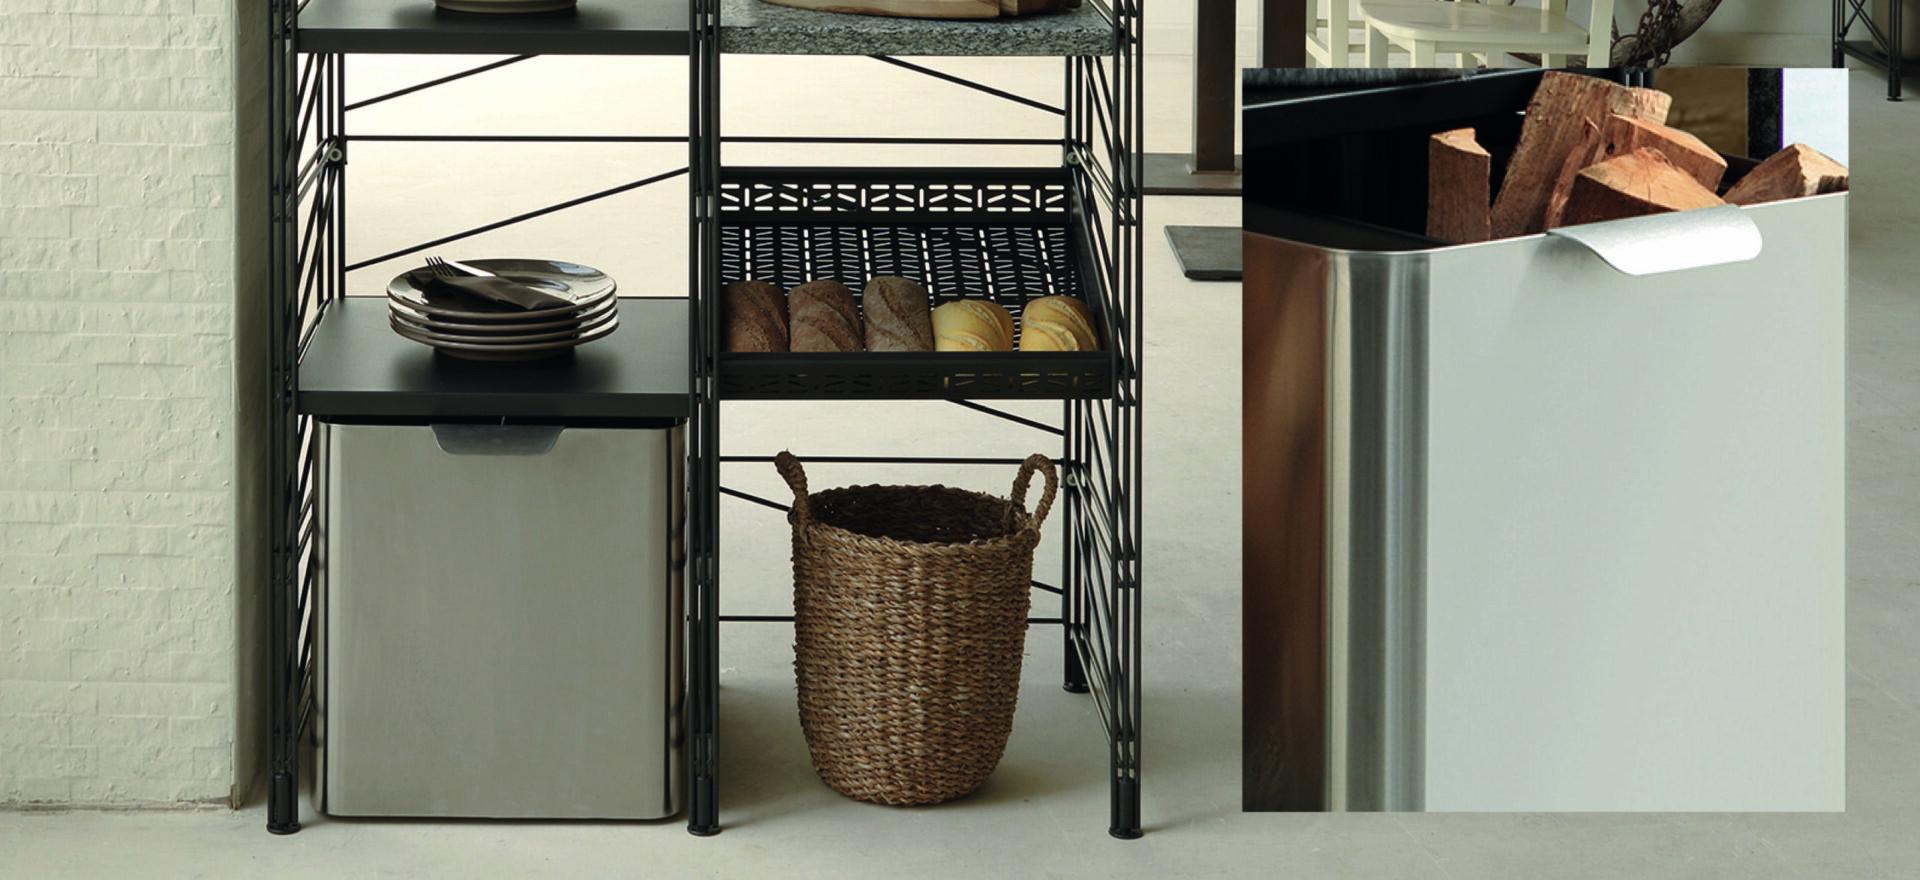 Socrate Outdoor_Outdoor Furniture_Caimi_Storage detailsMario Trimarchi Design